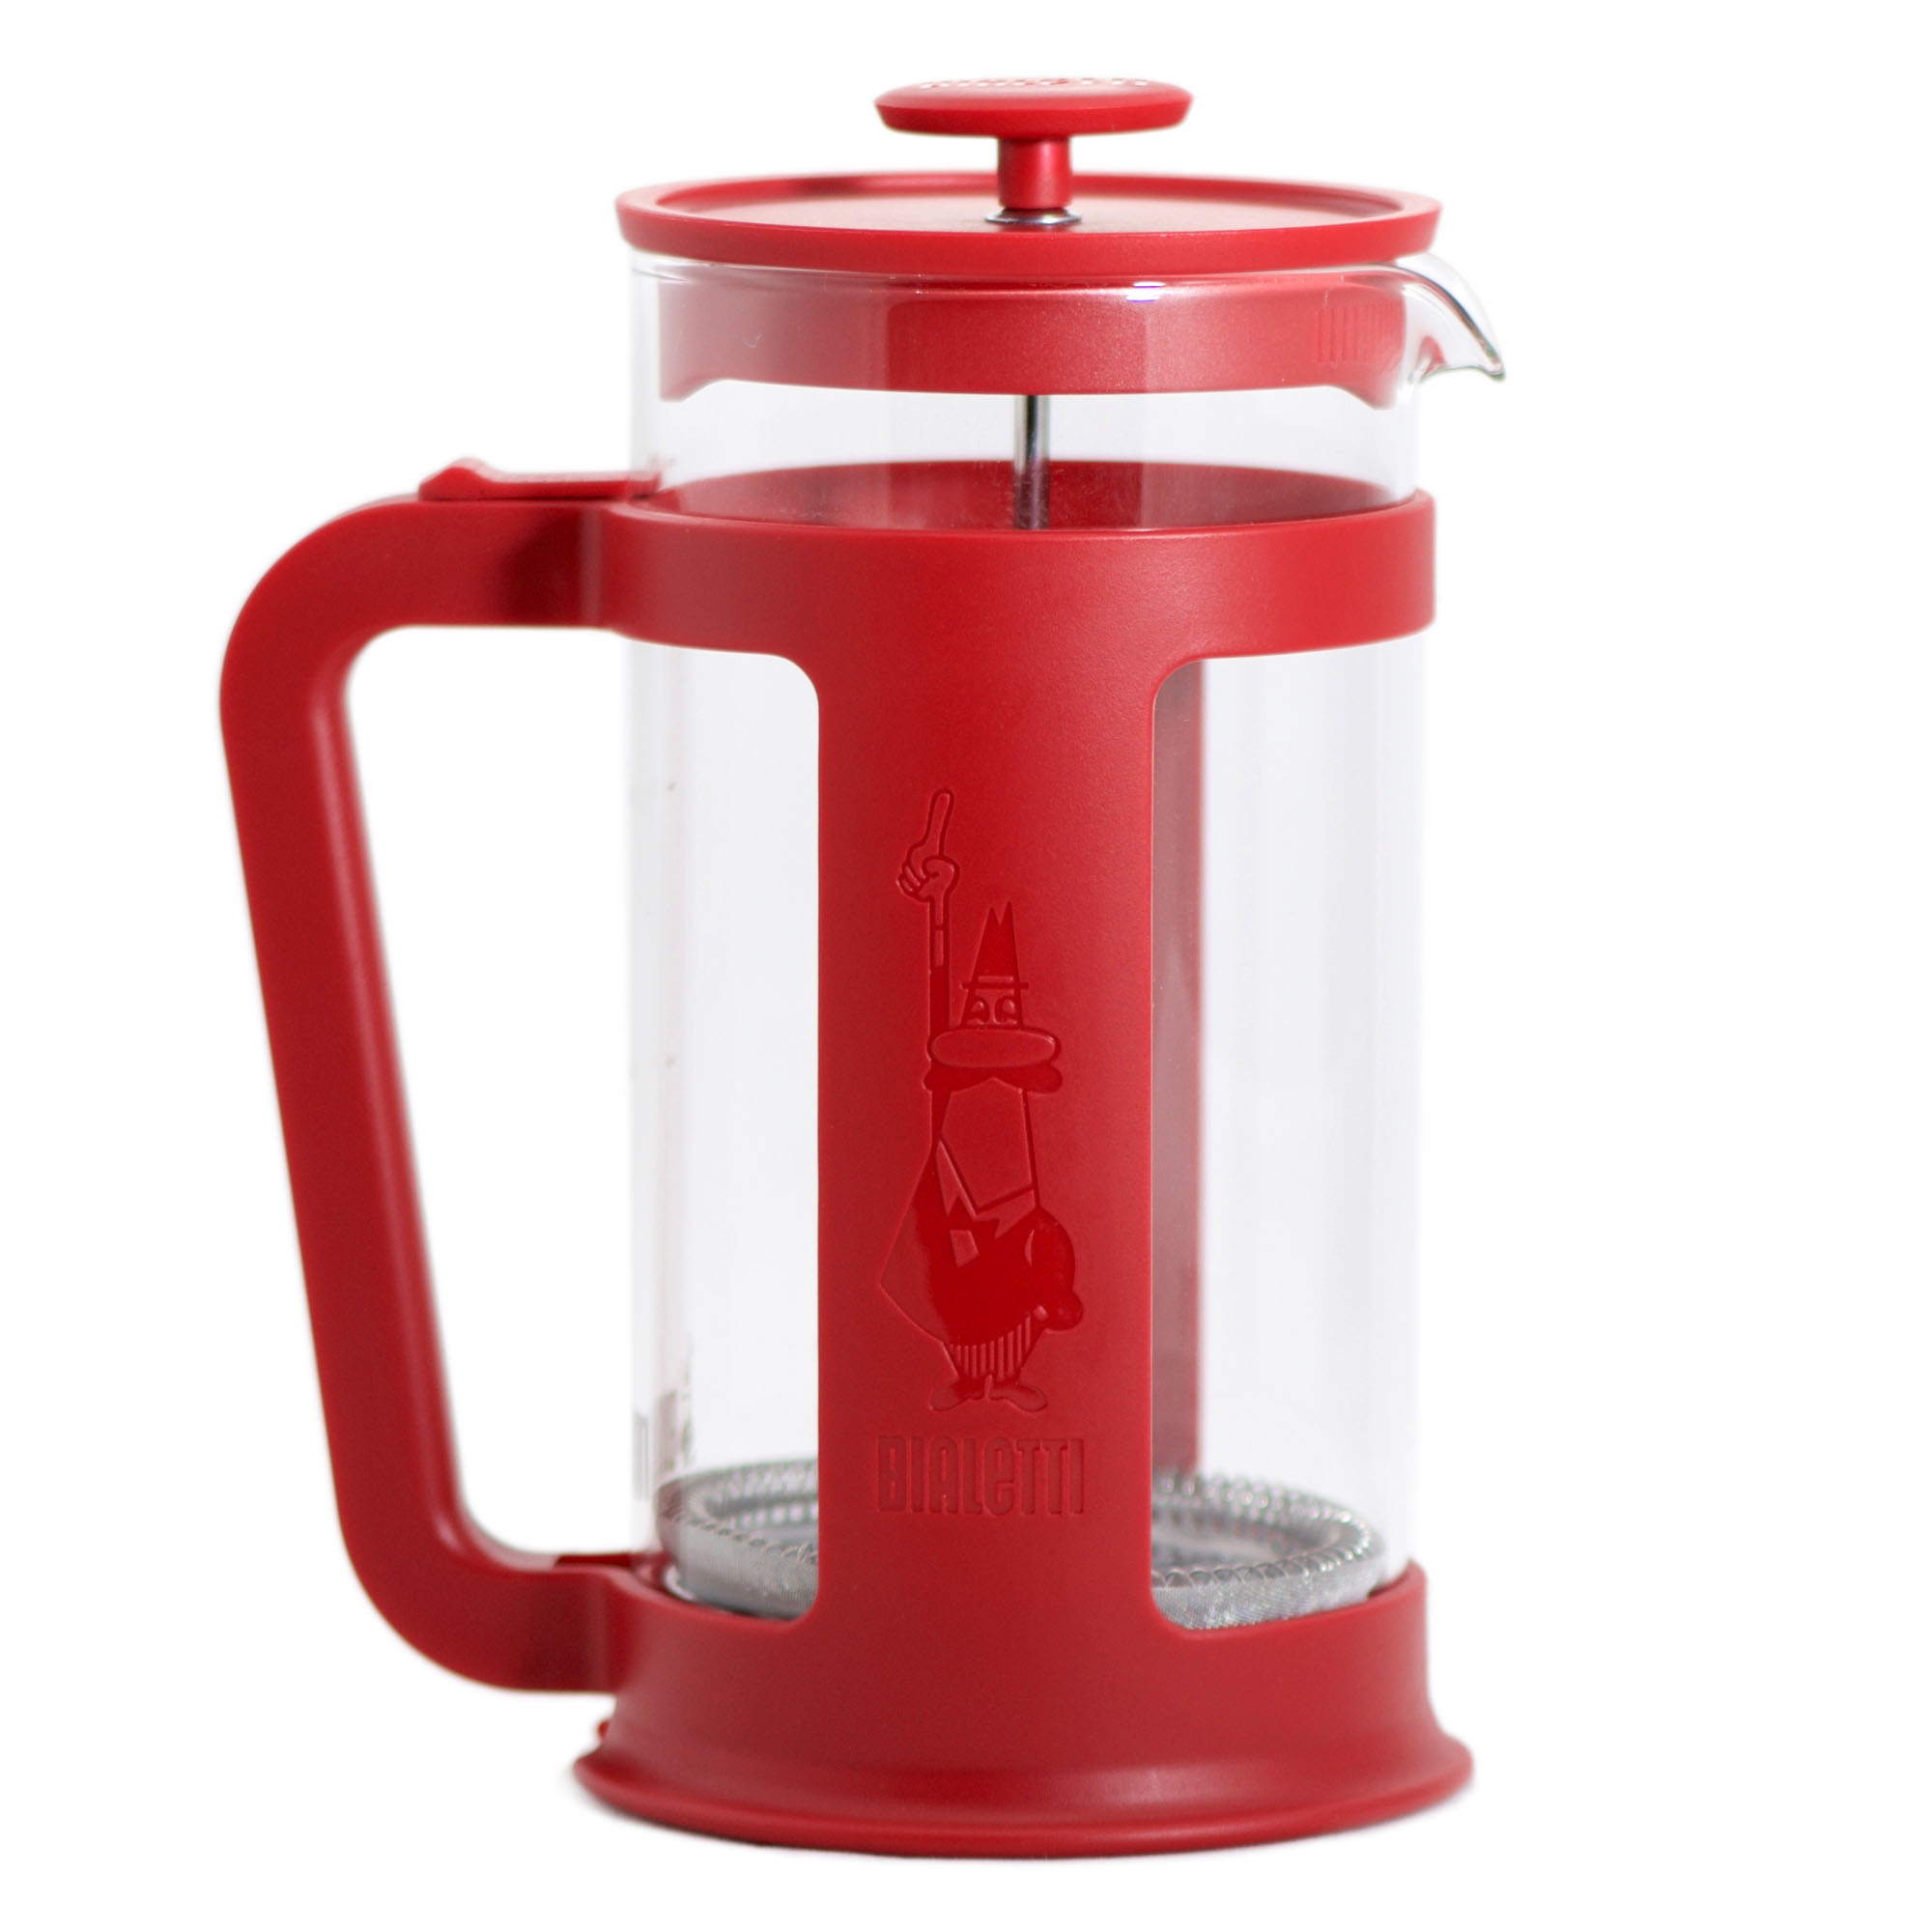 Cafeteira French Press Smart - 1L Vermelha - Bialetti